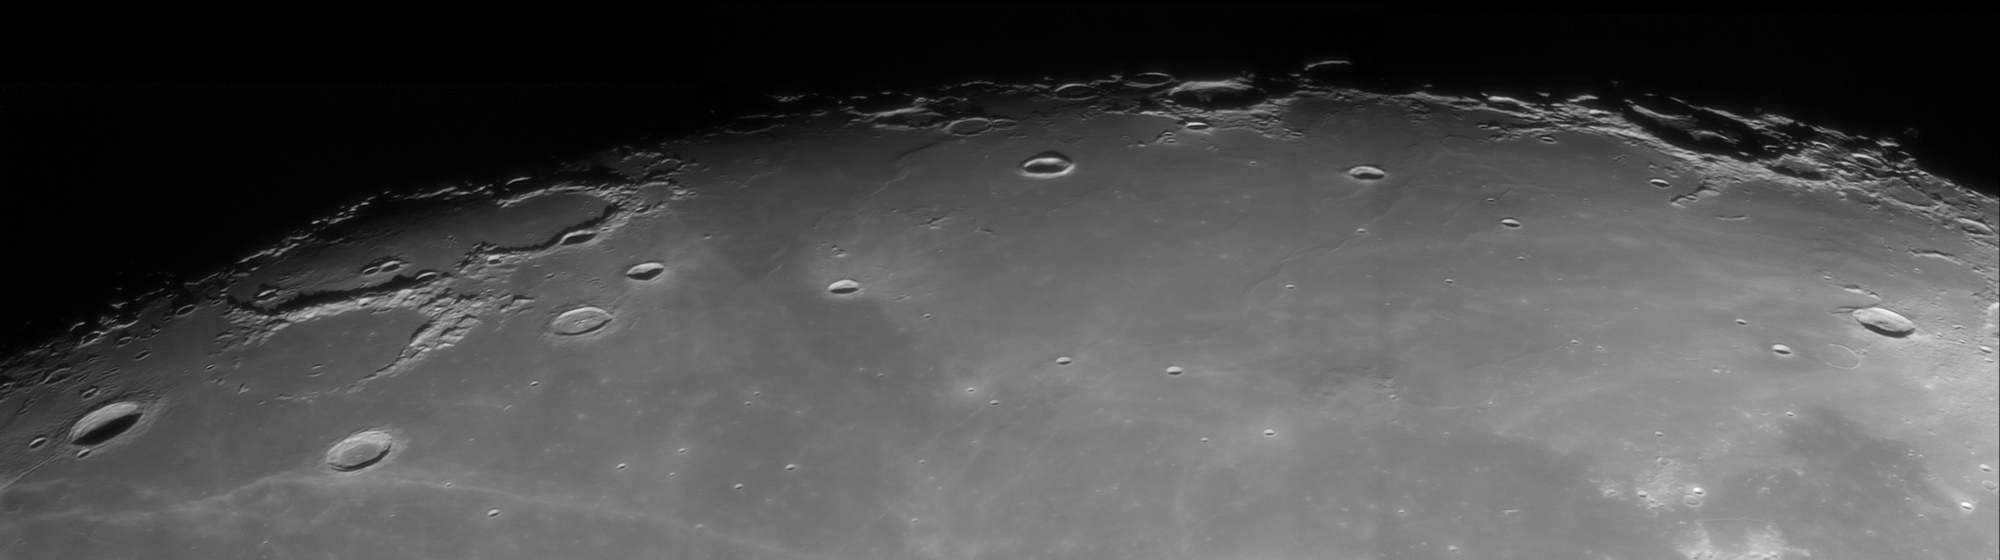 lune1.thumb.jpg.d28cf2851e96617033be2cca5b23aa9f.jpg